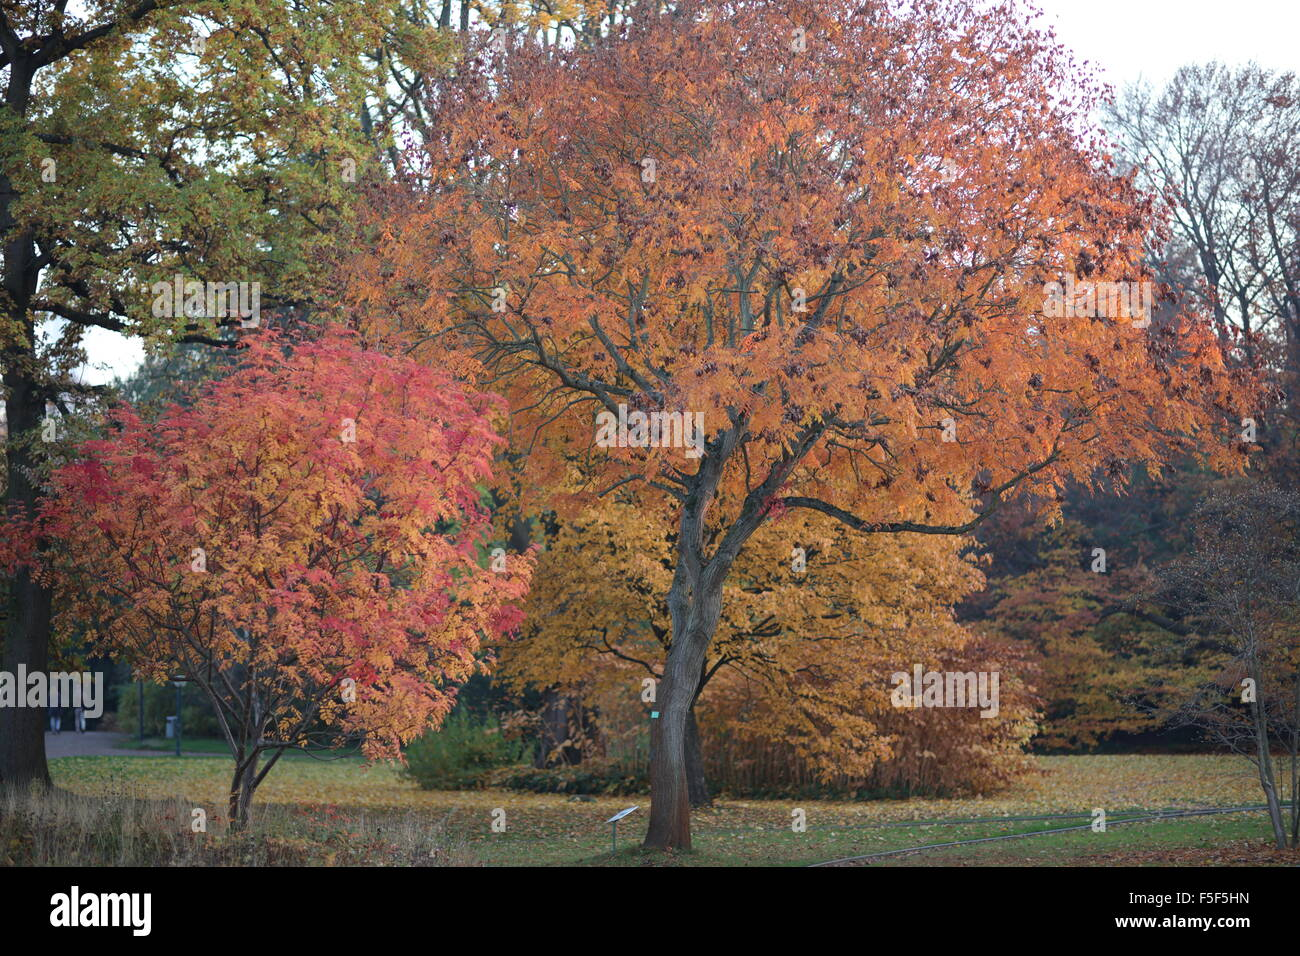 fall-in-frankfurt-botanical-garden-F5F5H